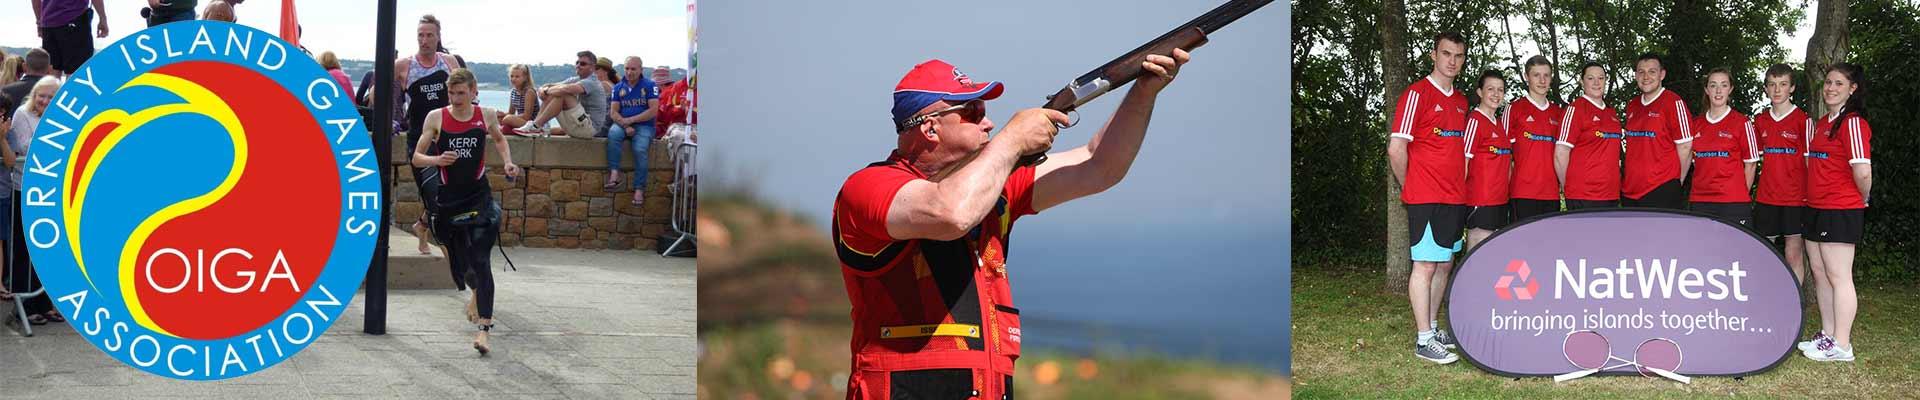 Orkney Island Games Association